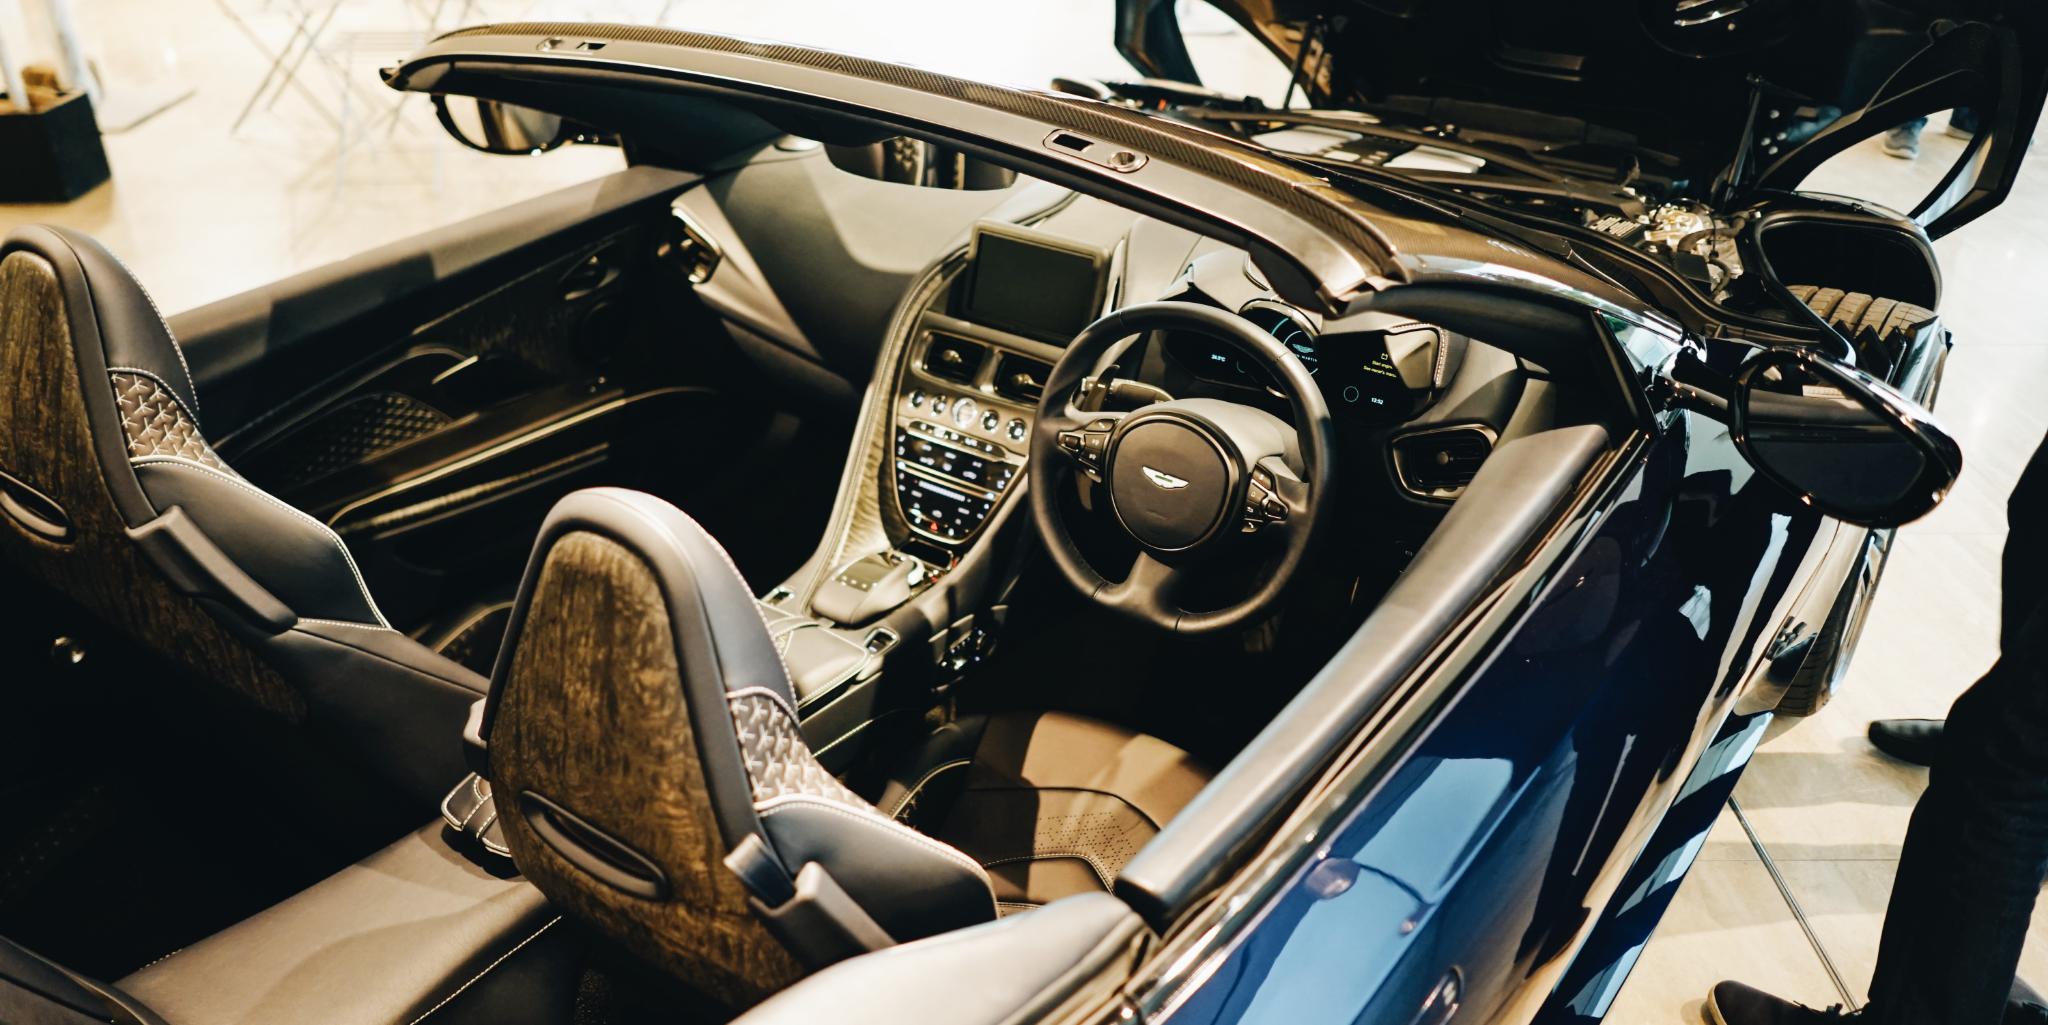 Aston Martin DBS Superleggera Volante Interior